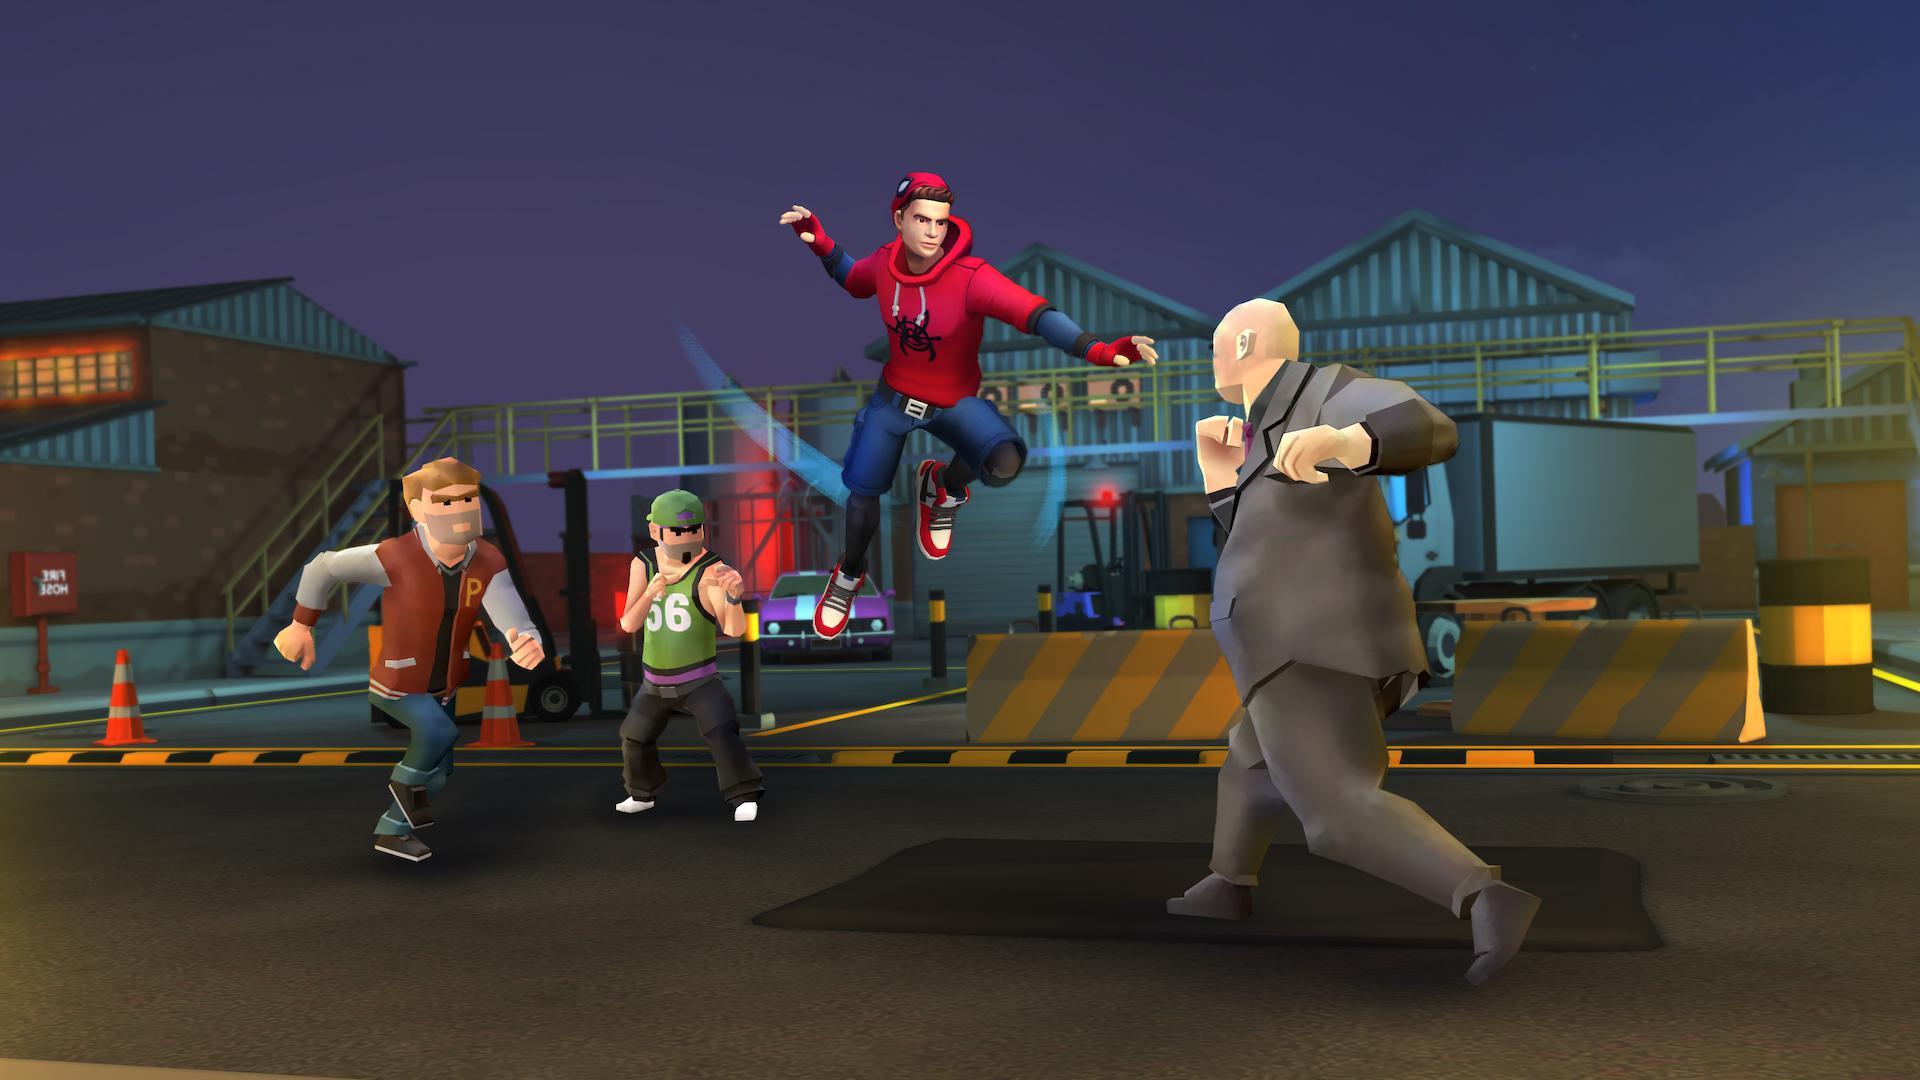 Spider Fighter: Superhero Revenge 游戏截图3